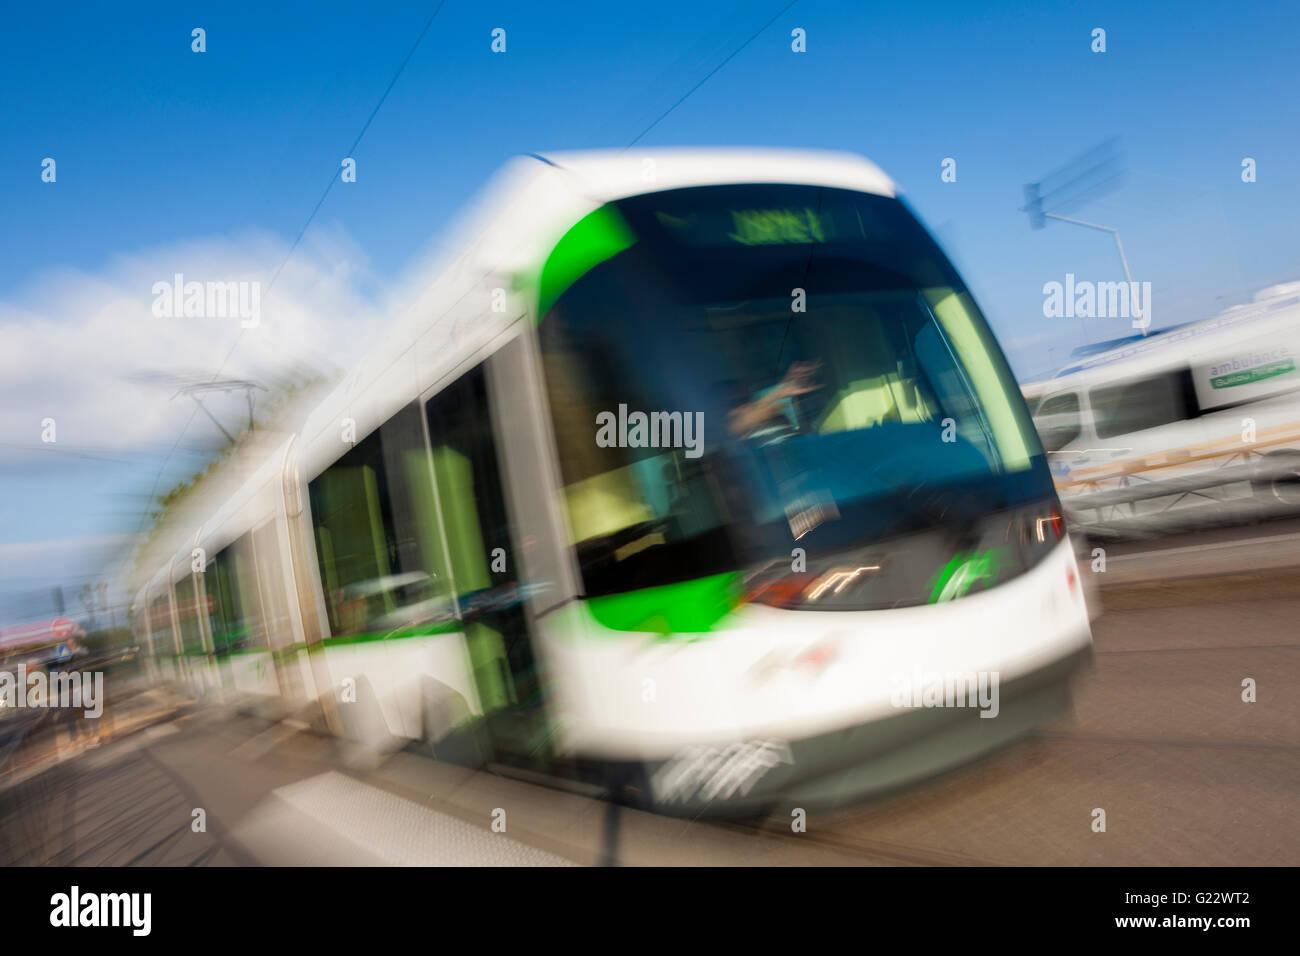 Nantes Metropole Straßenbahnen, Nantes, Pays De La Loire, Frankreich Stockbild